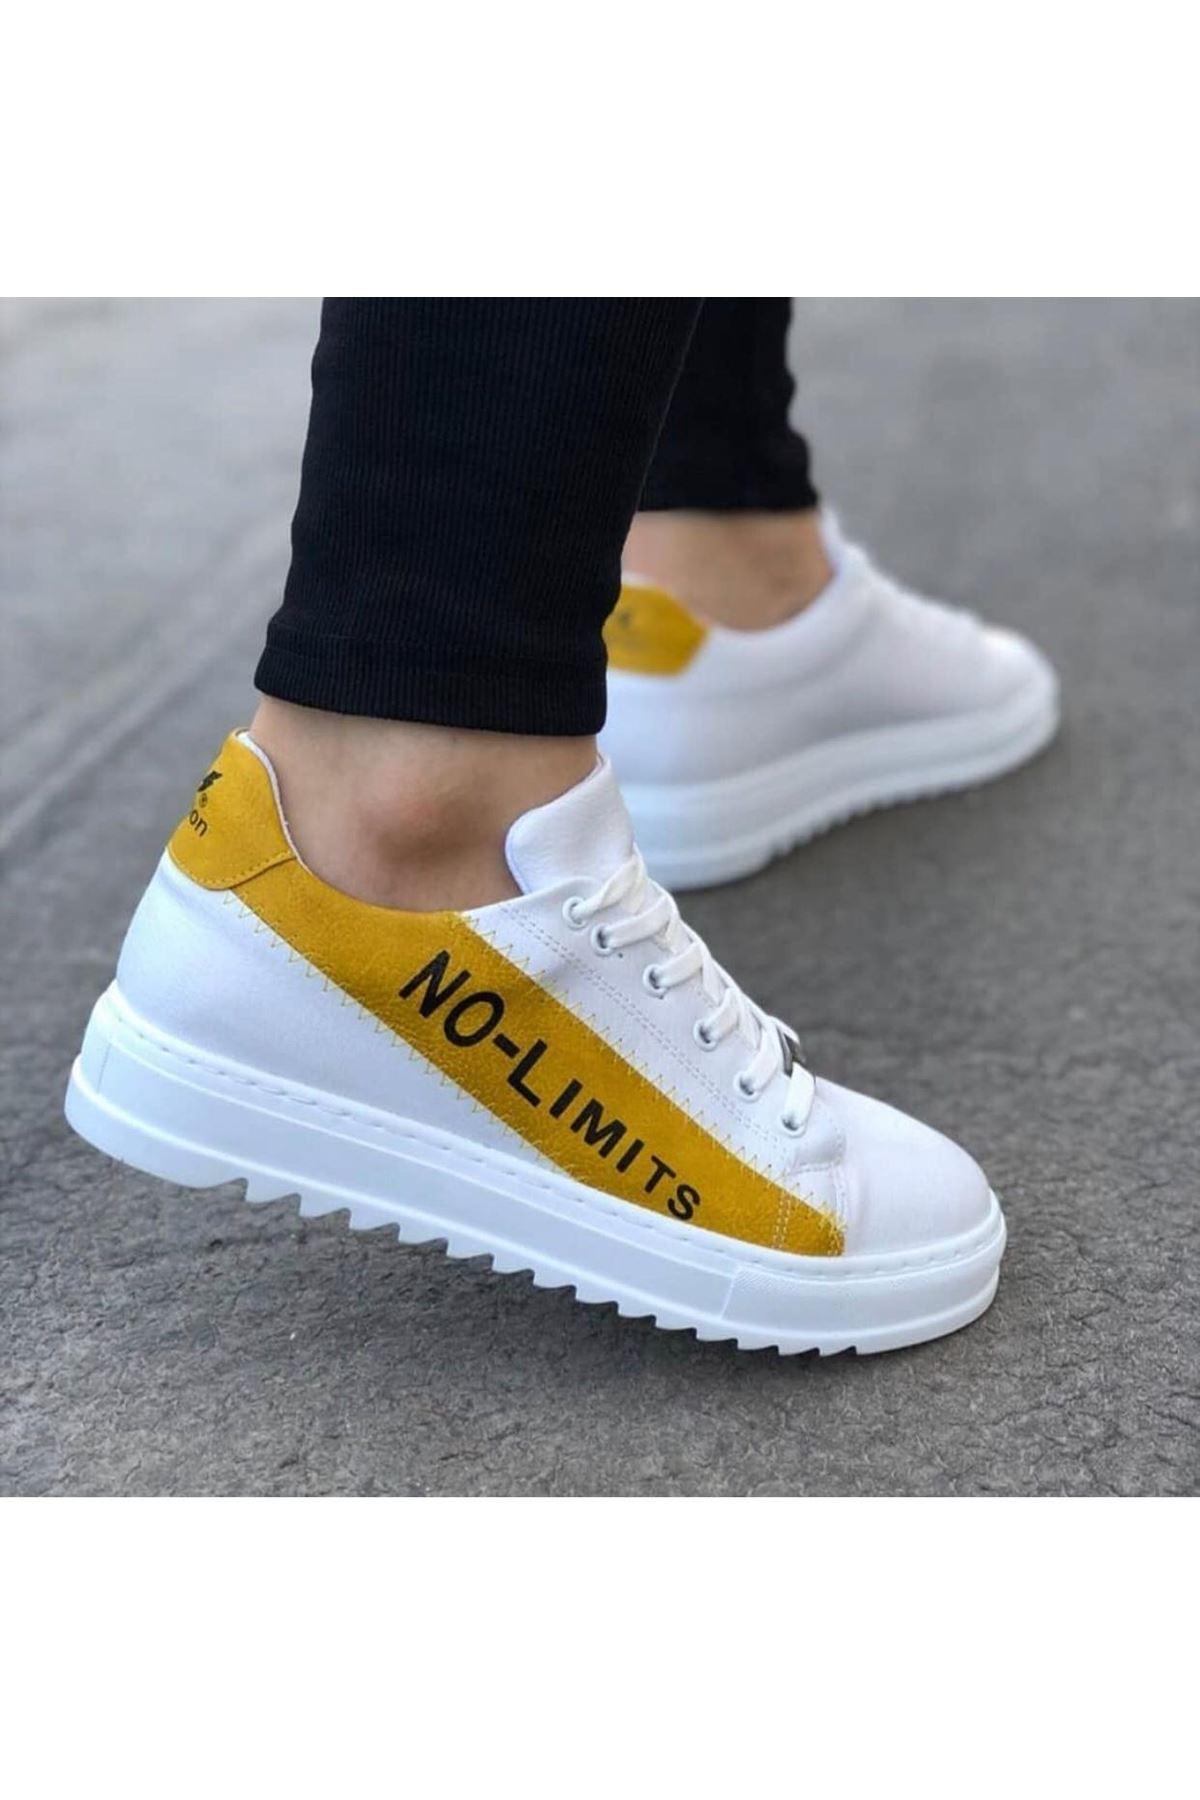 Wagoon WG027 Beyaz Sarı No Limit Erkek Casual Ayakkabı